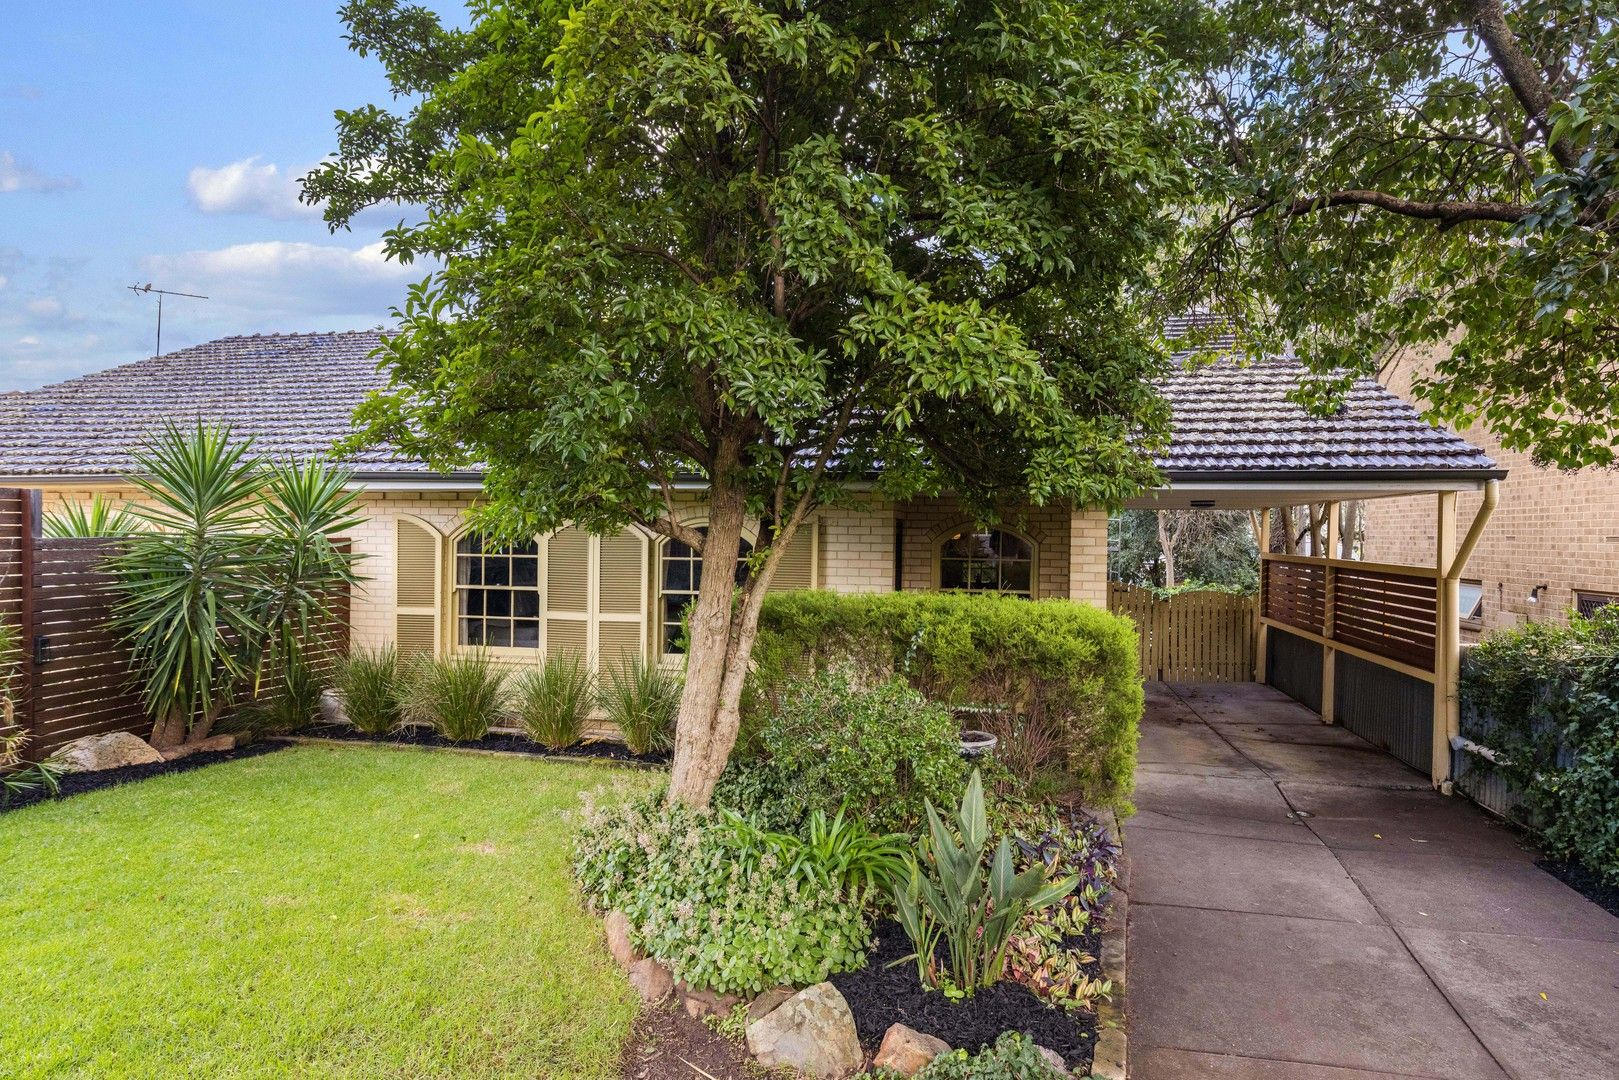 3 bedrooms House in 629B Portrush Road GLEN OSMOND SA, 5064